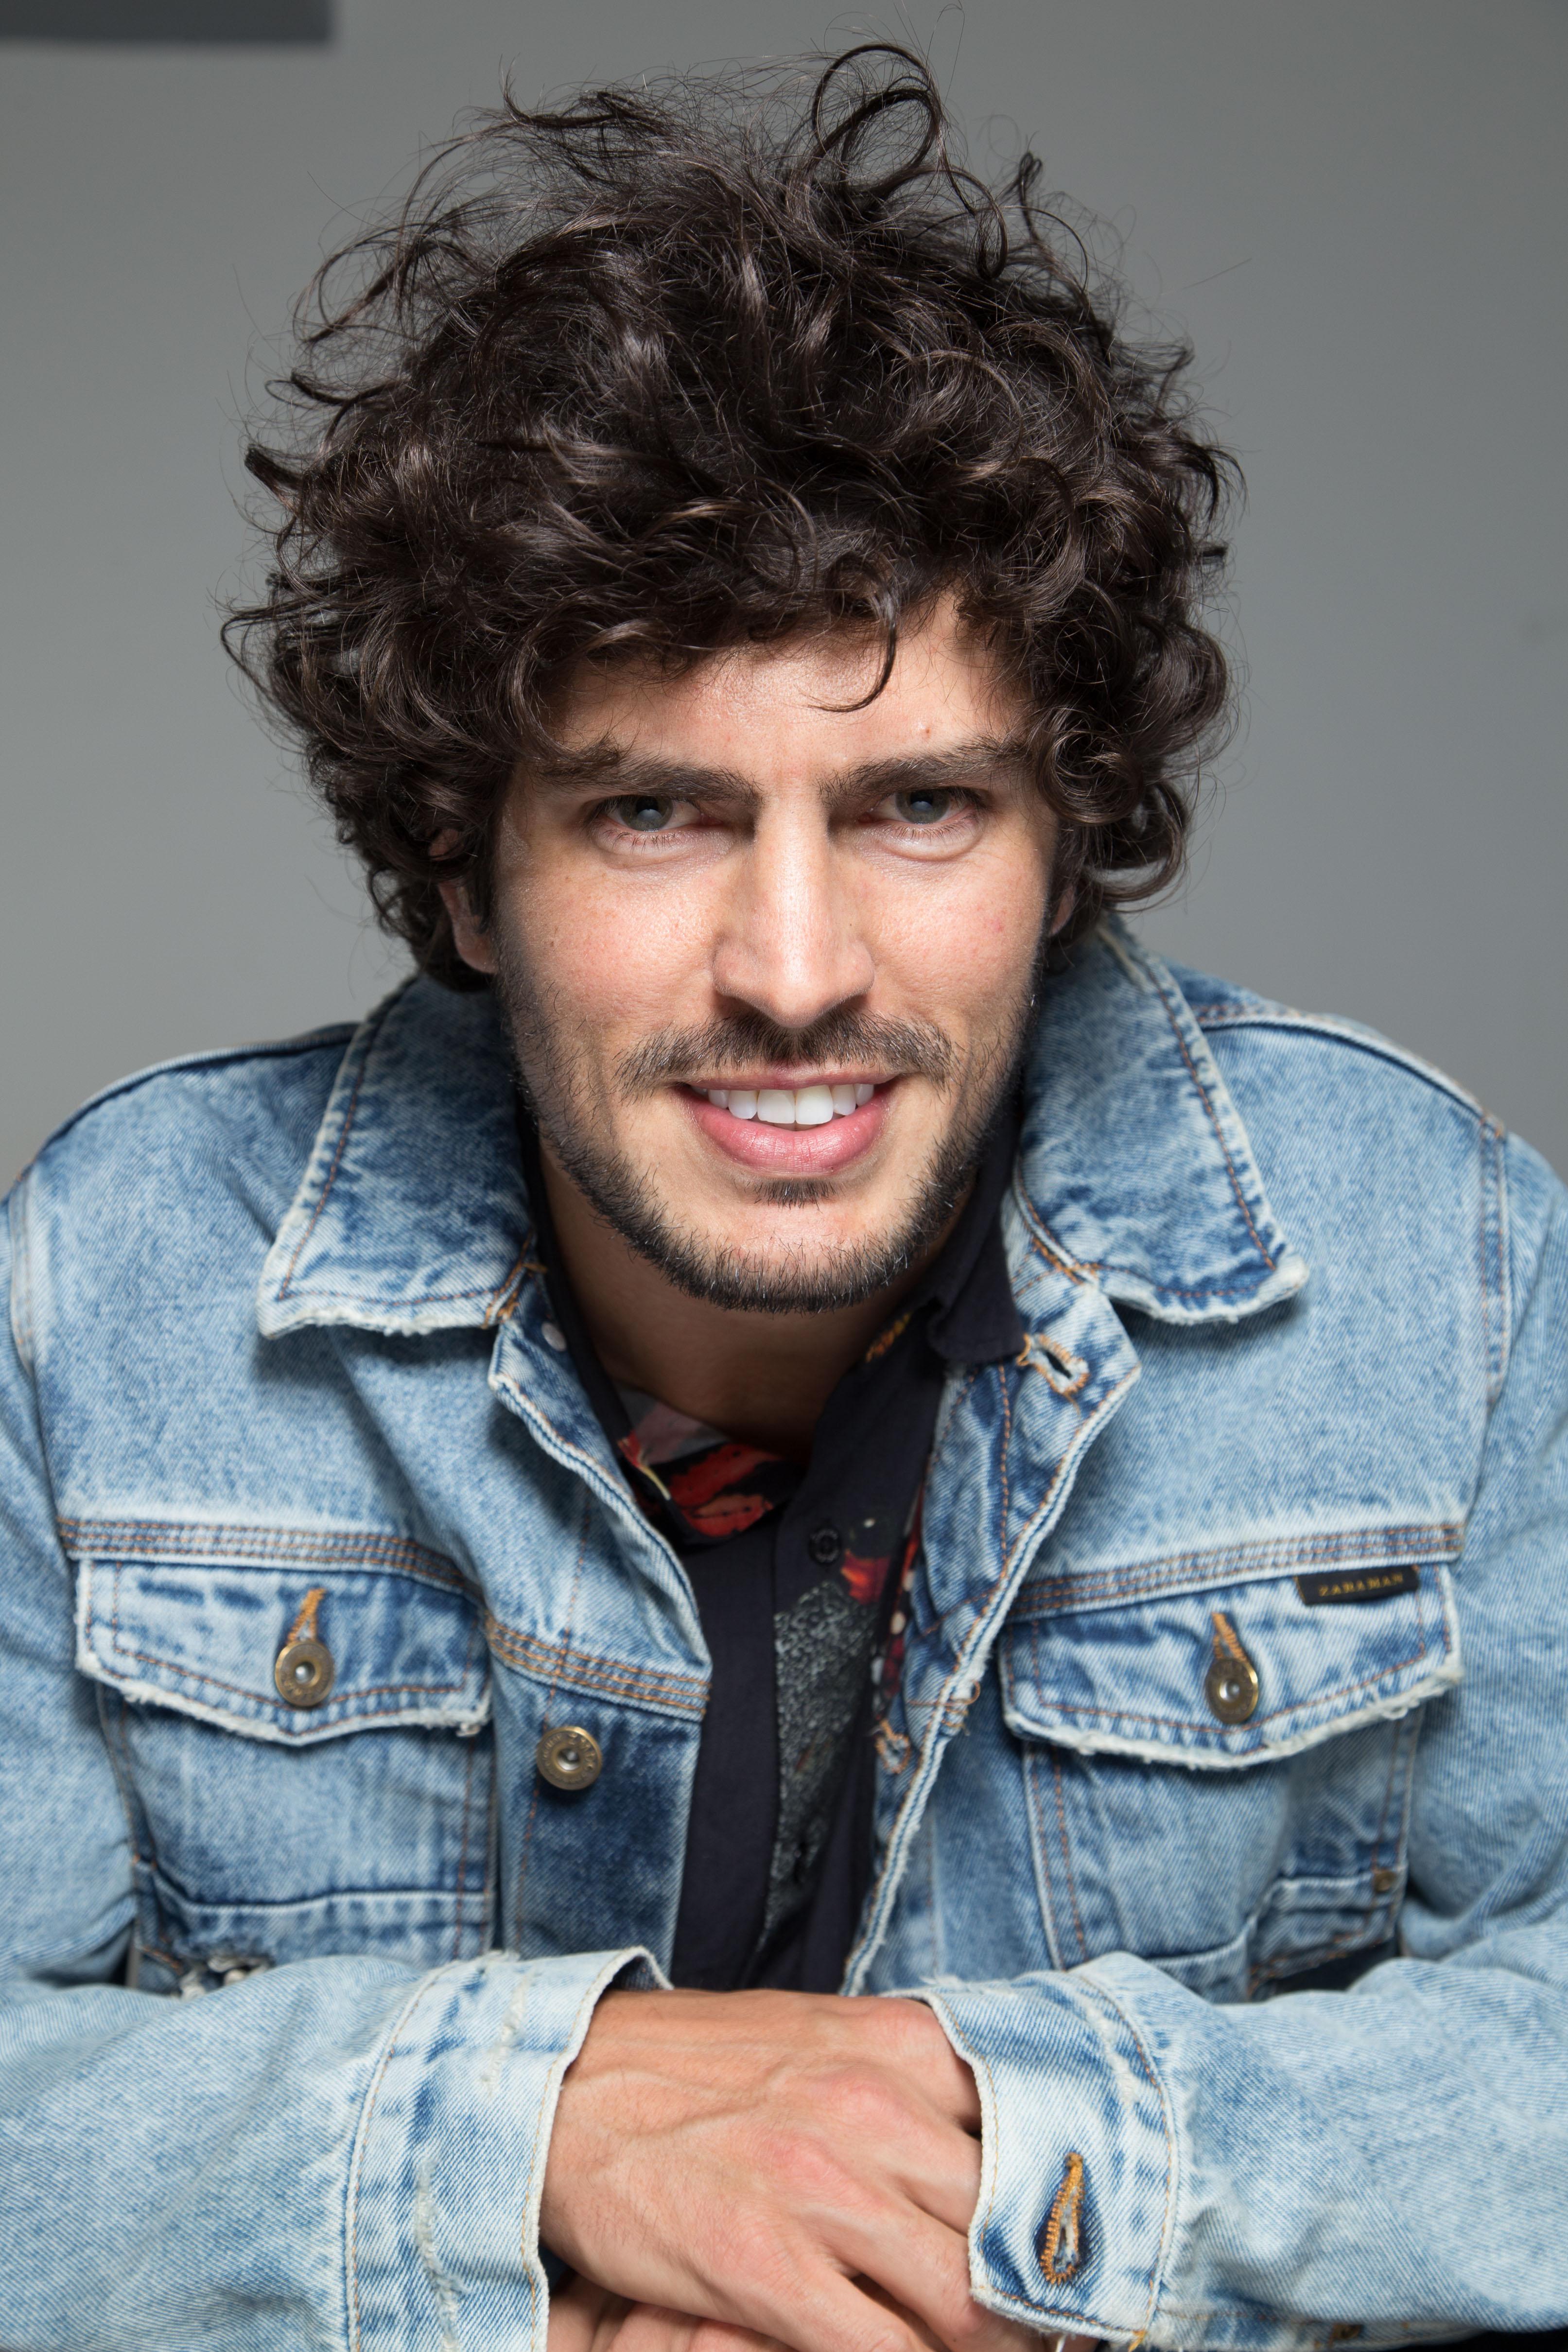 Dego_Ferreira (206)